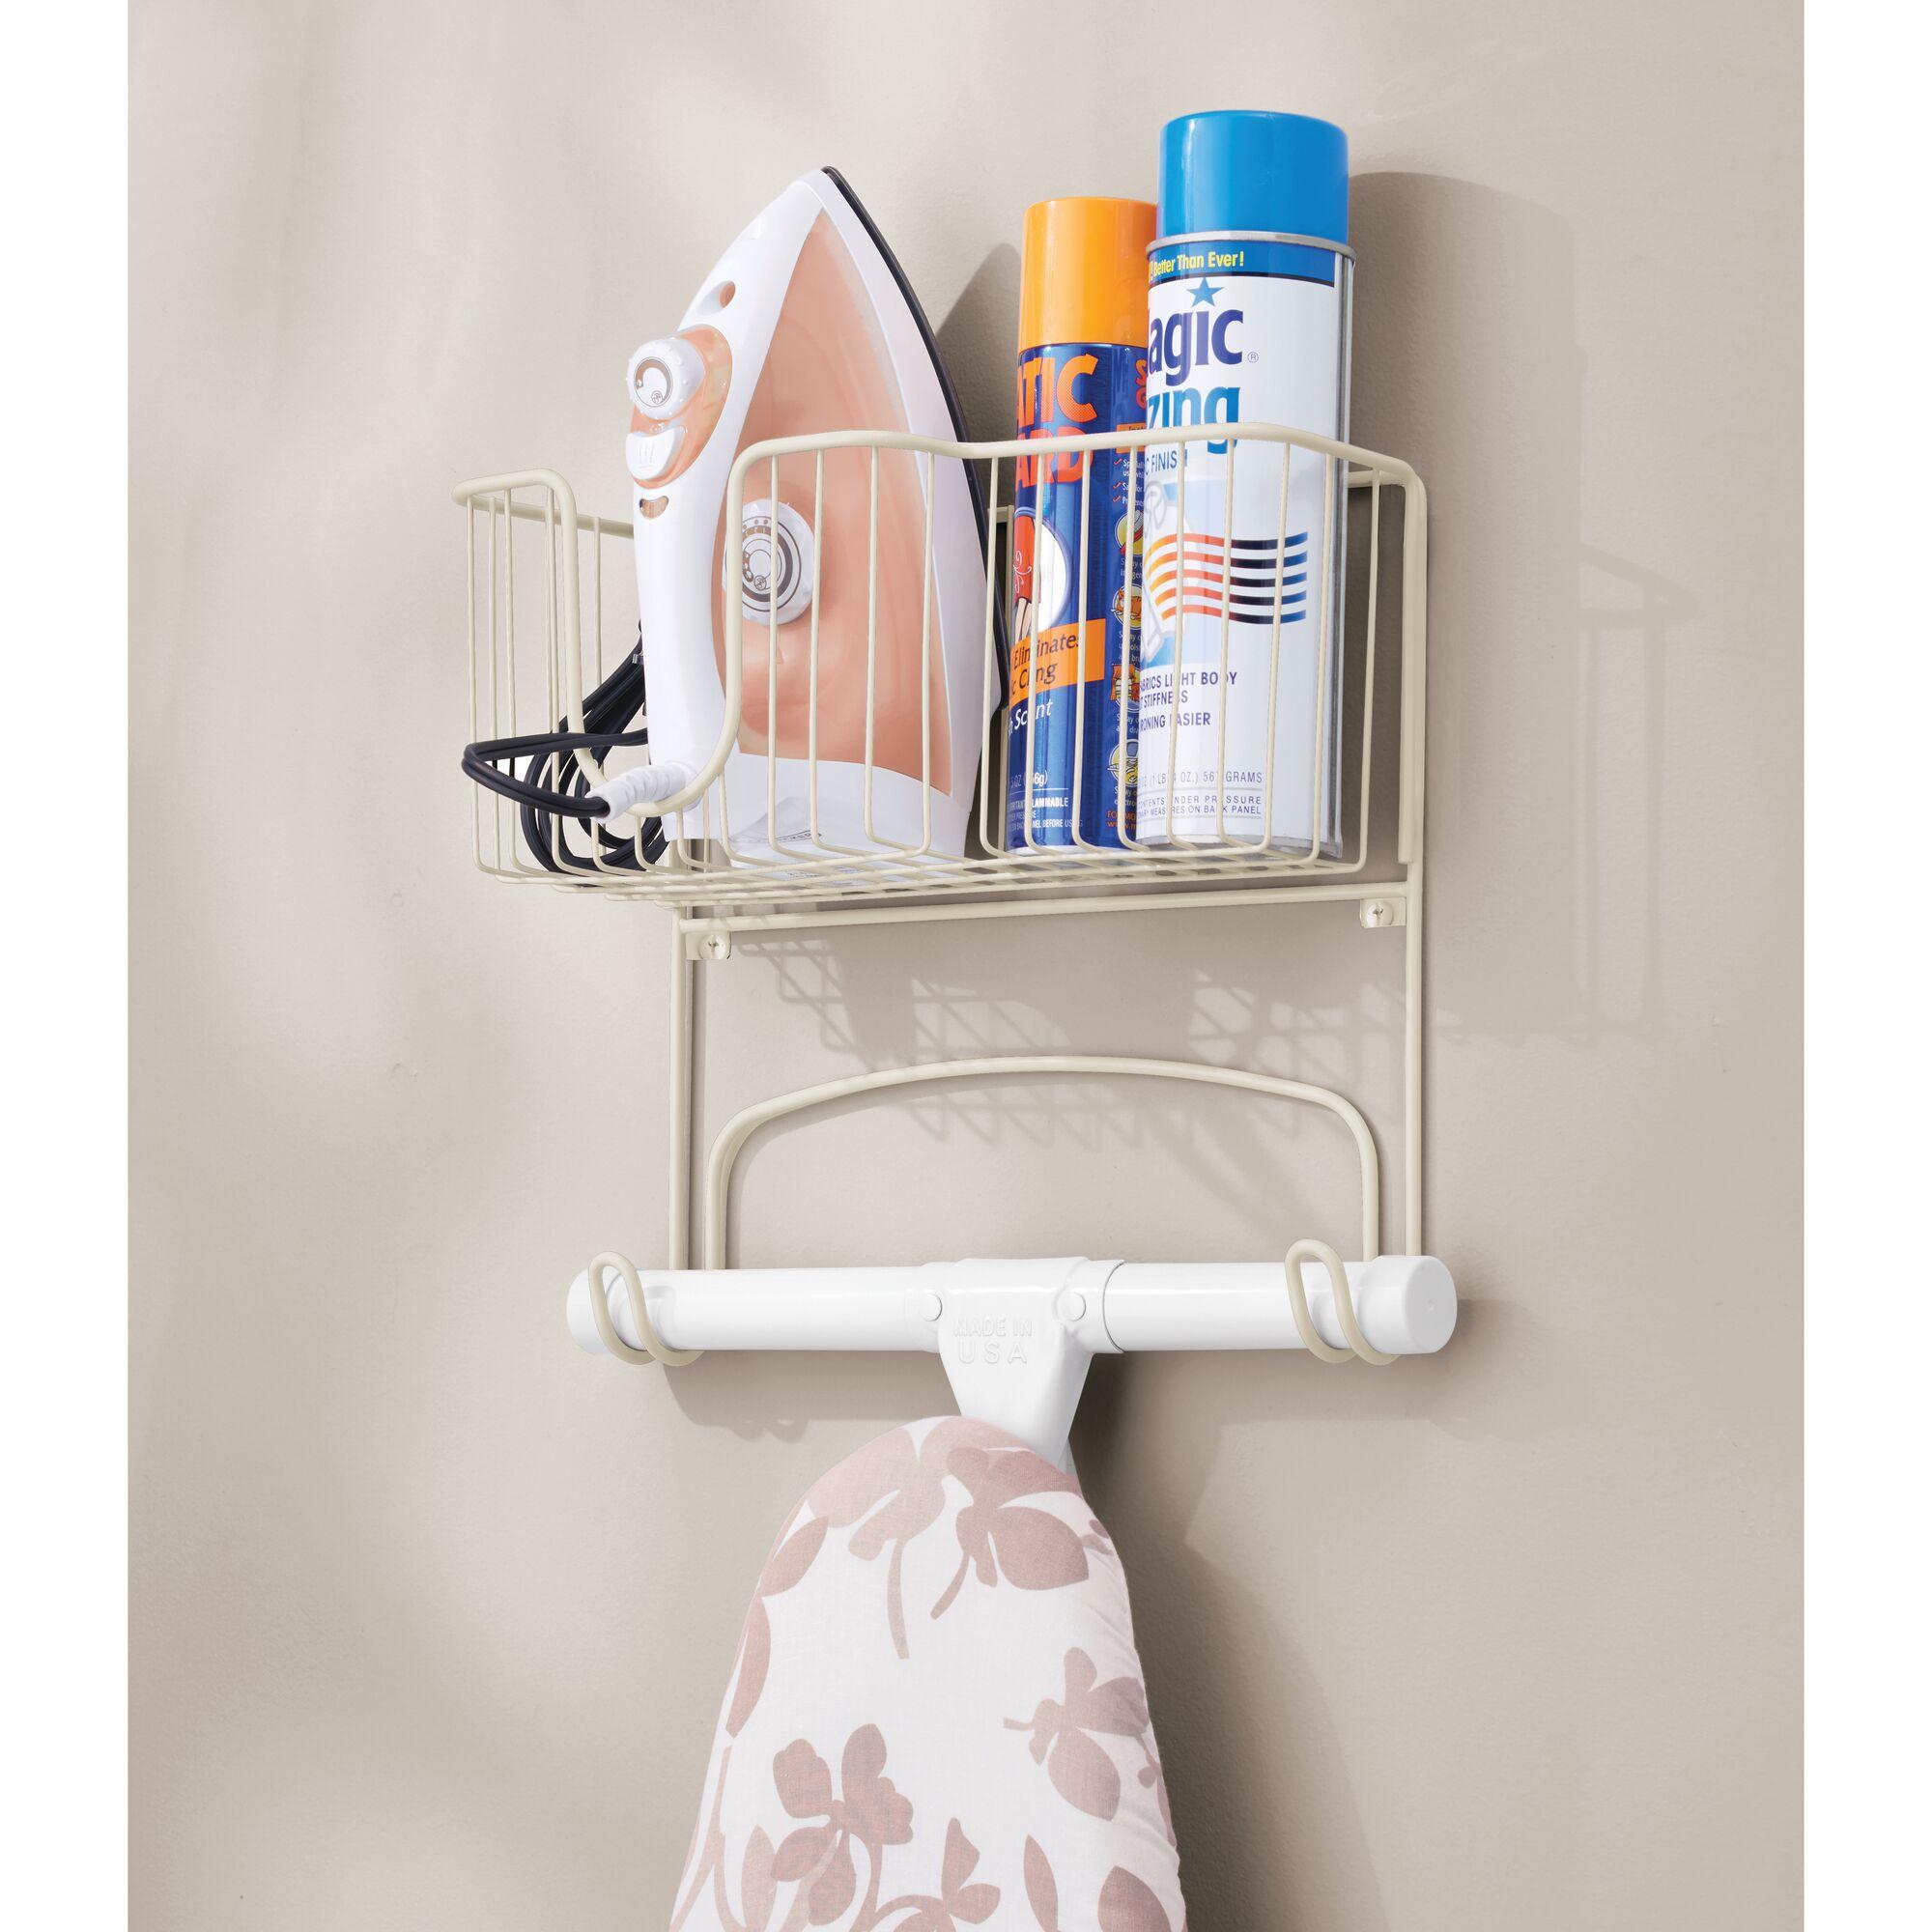 mDesign-Wall-Mount-Ironing-Board-Holder-Large-Storage-Basket thumbnail 48